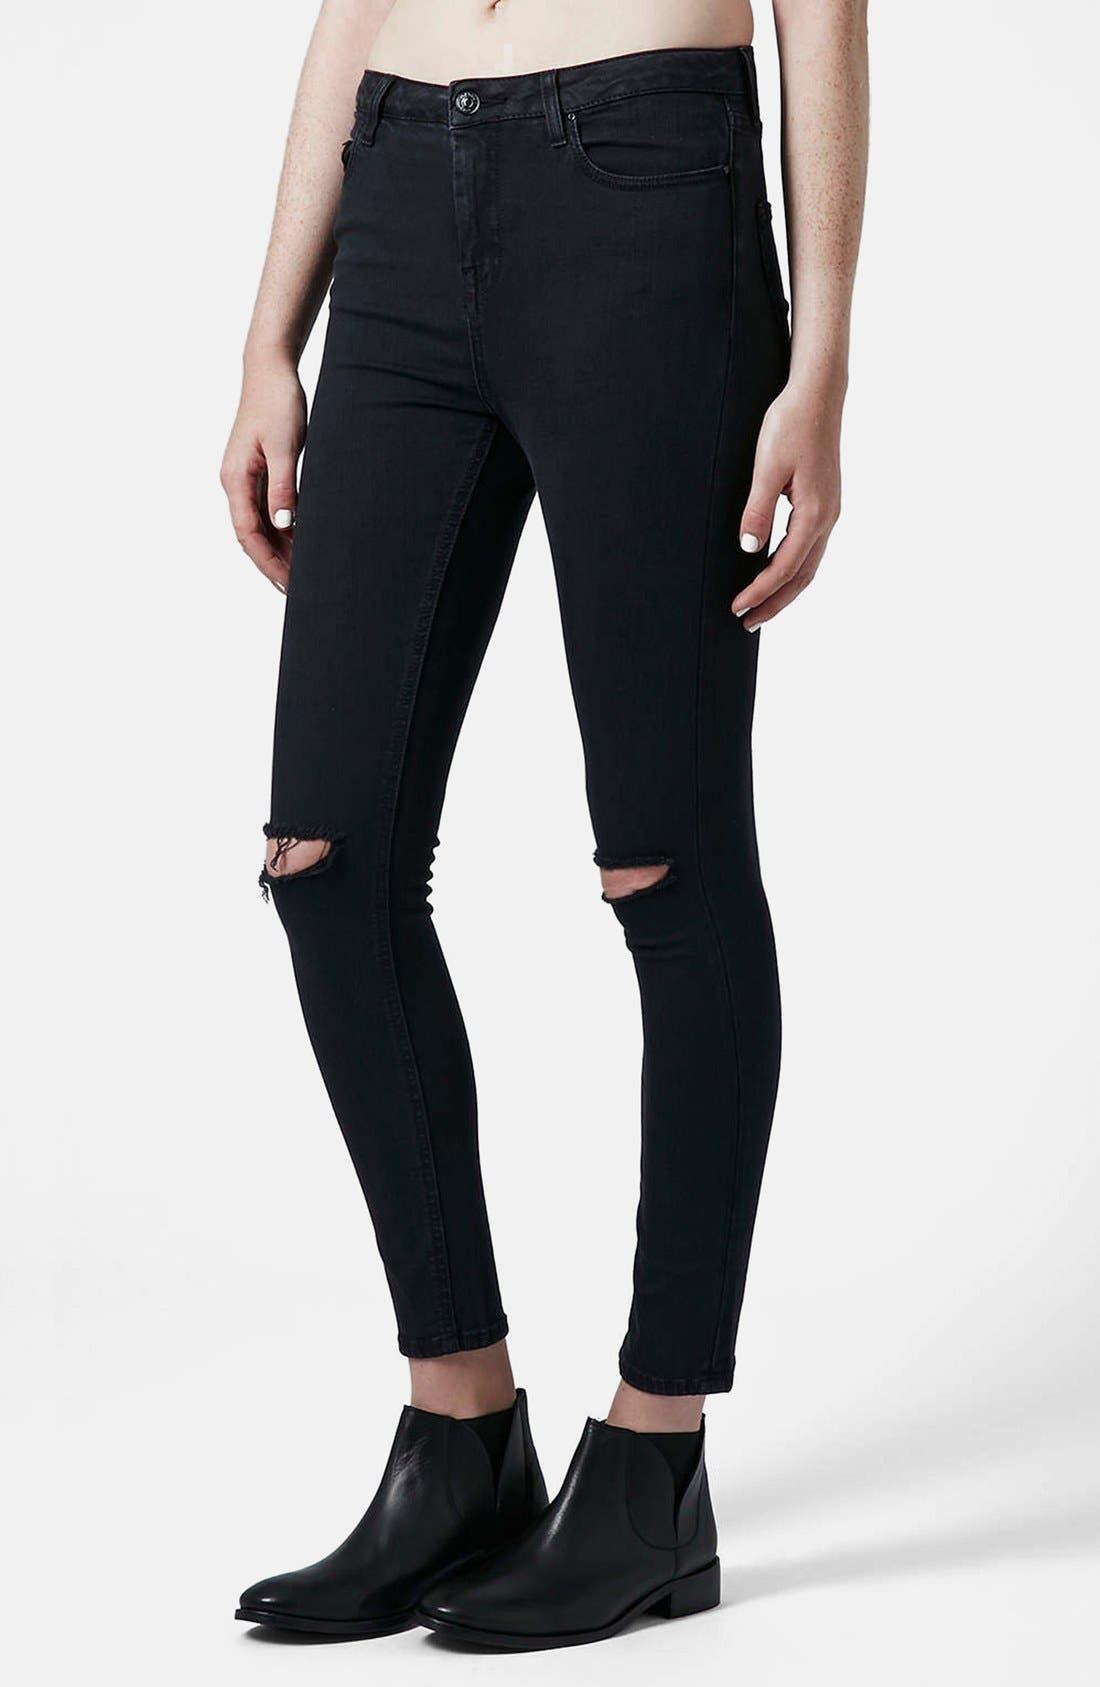 Main Image - Topshop Moto 'Jamie' Dark Wash Ripped Slim Jeans (Black) (Short & Regular)